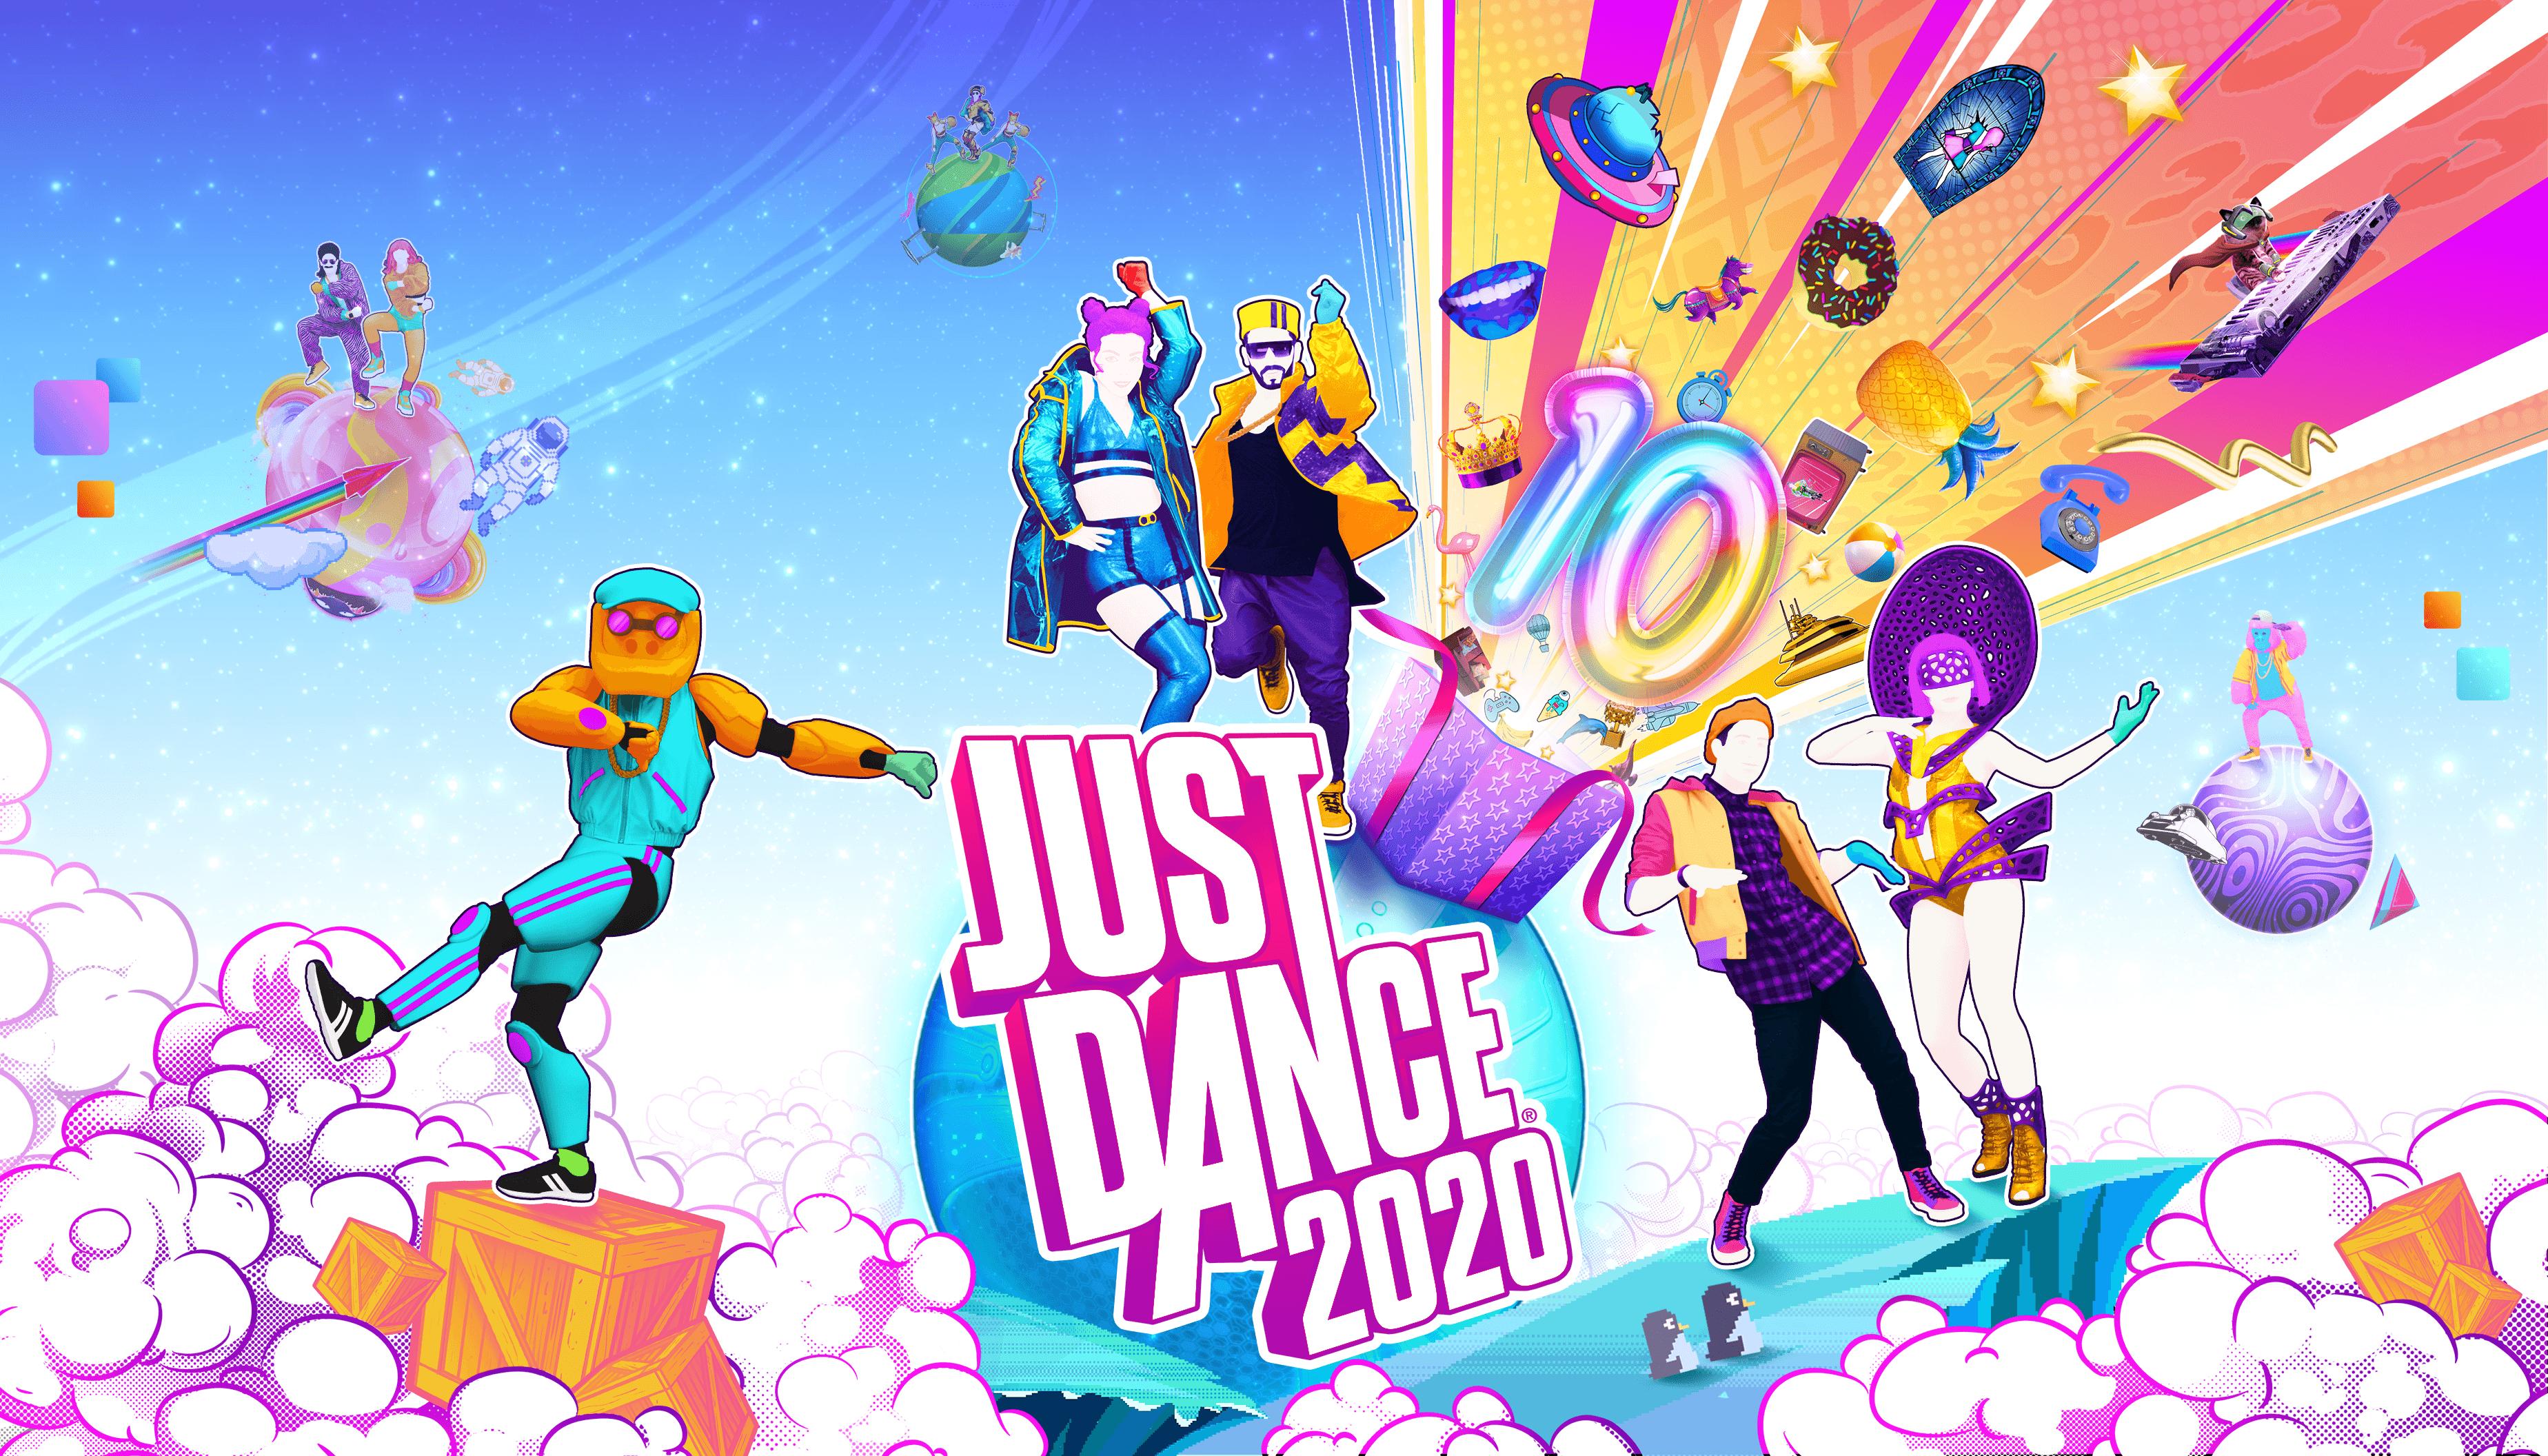 Just Dance 2020 Wallpapers 3696x2112